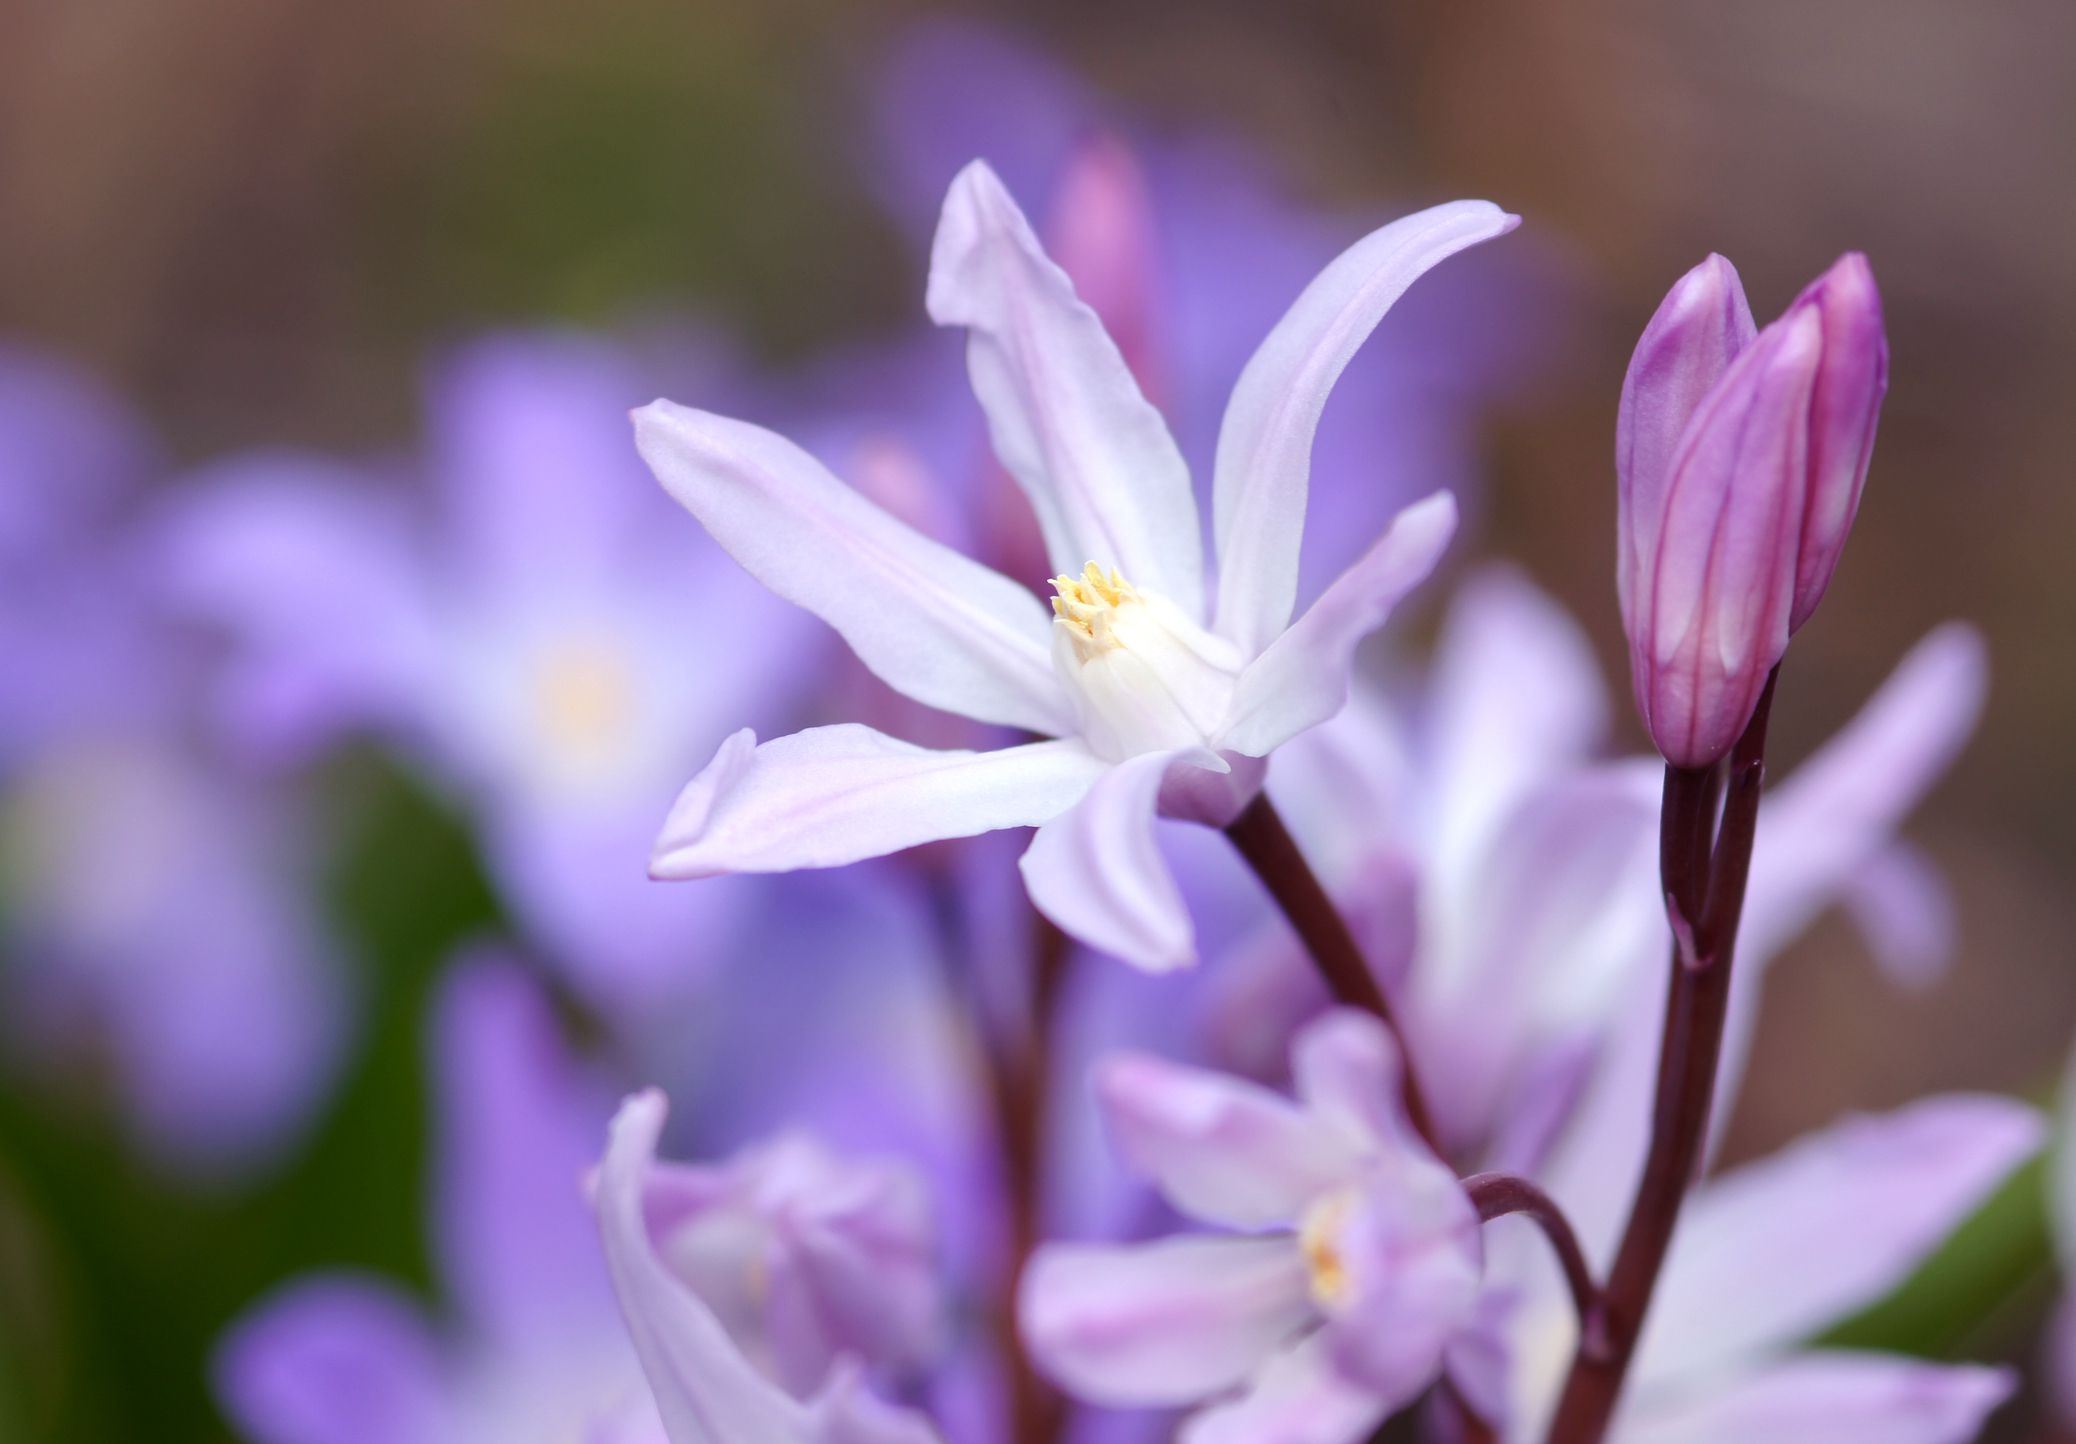 Chionodoxa plant in bloom.